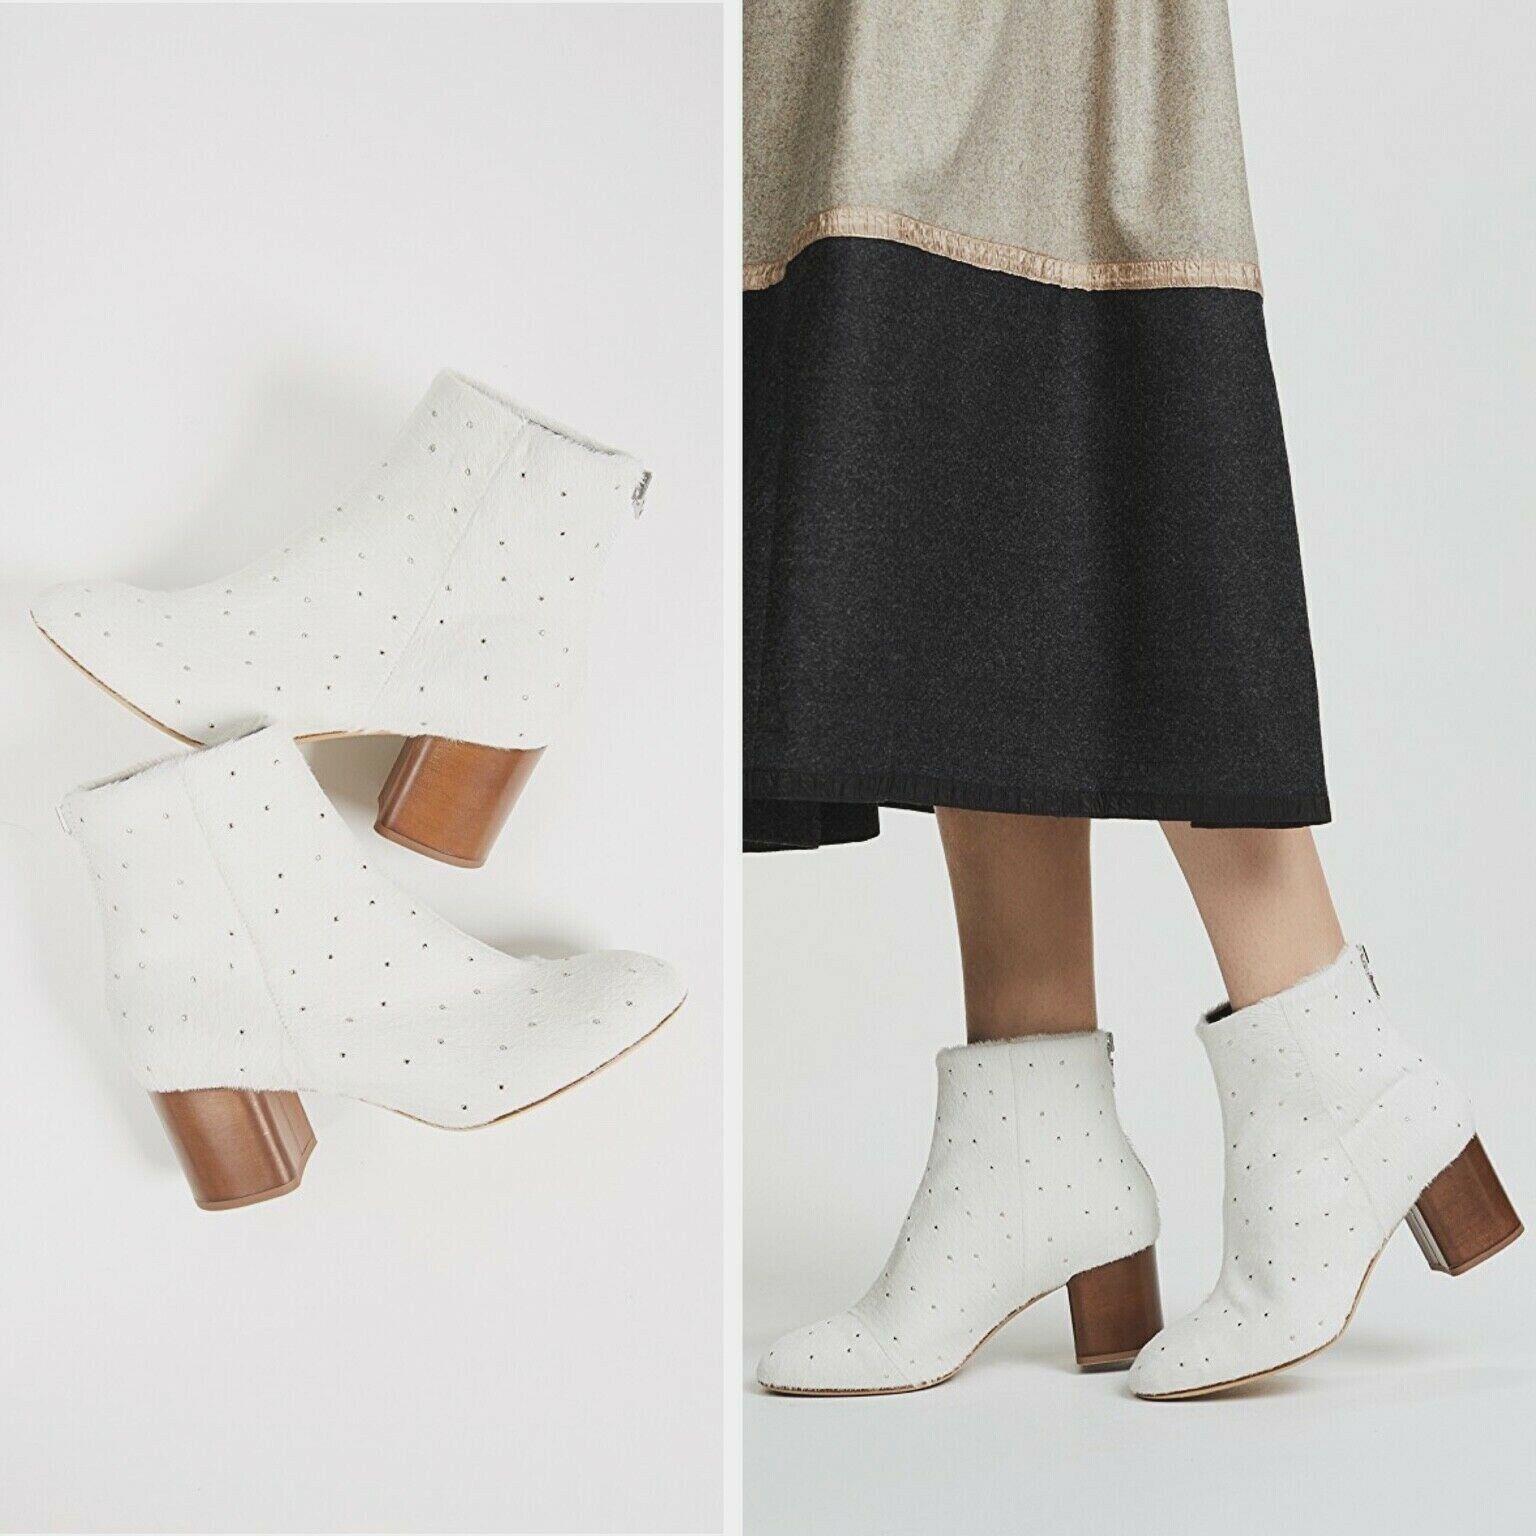 Neu Rag & Bone Damen Drea... Weiß Wade Haar Stiefel Größe  US 9.5 Eu 39.5  1